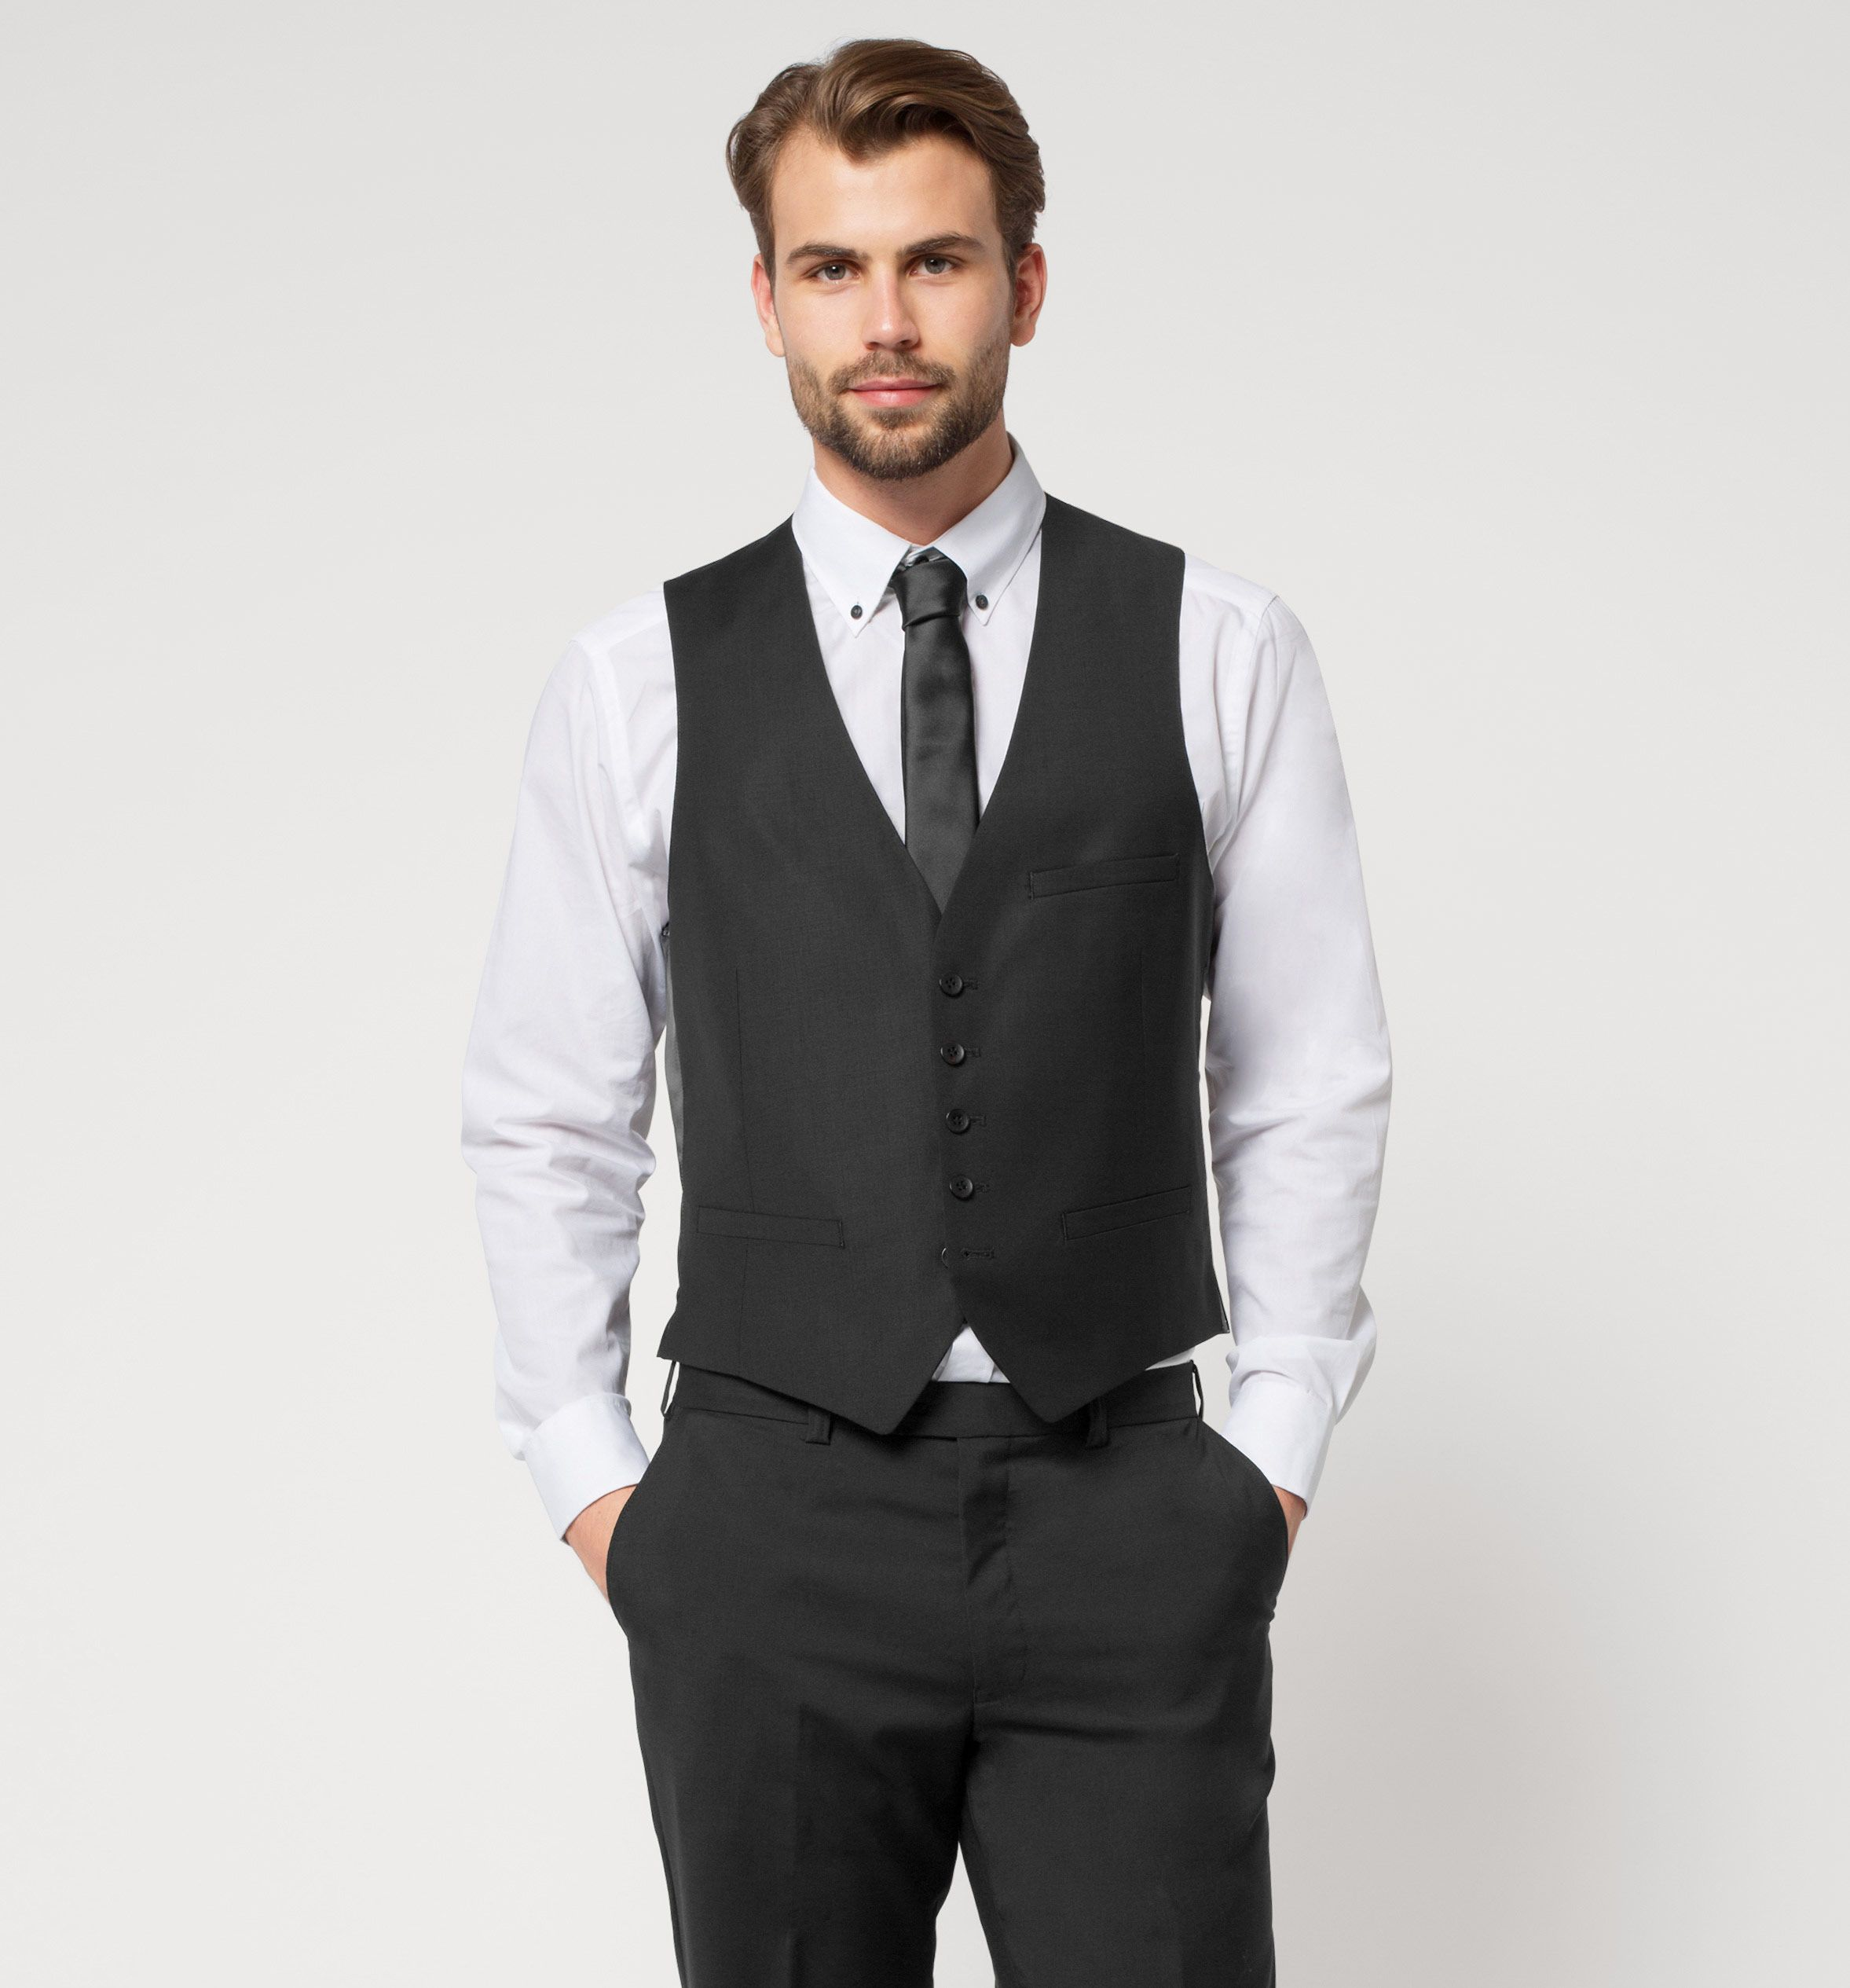 f0c15bb81d Chaleco de traje en negro. Chaleco de traje en negro Chaleco De Vestir  Hombre ...